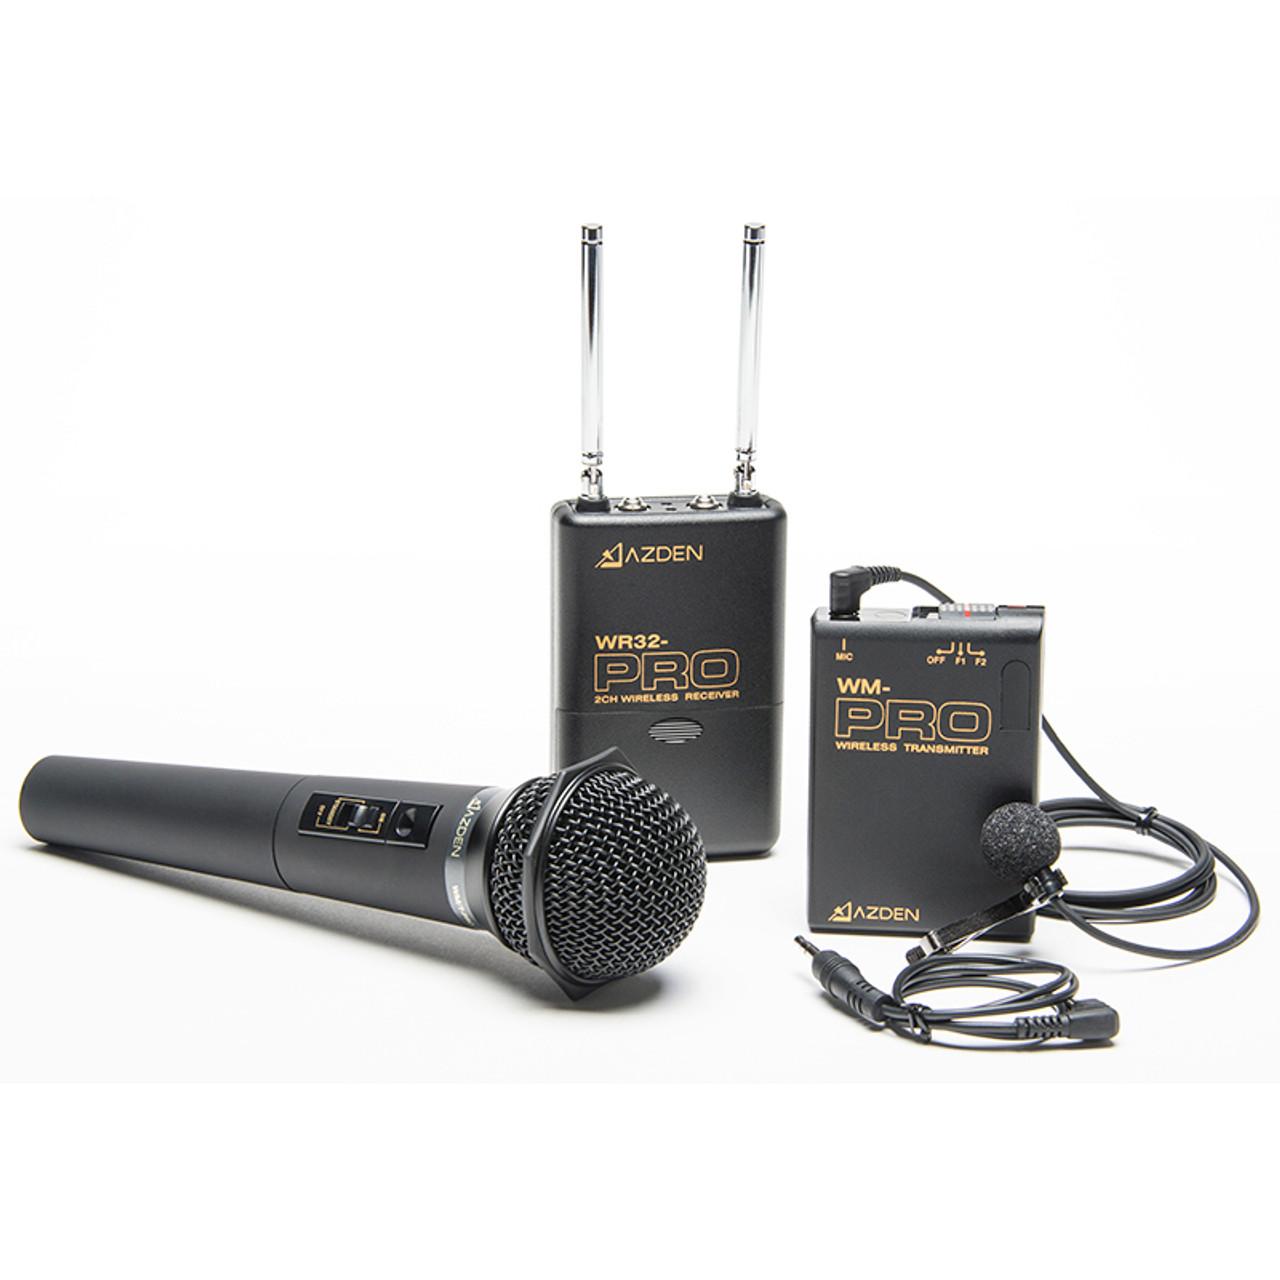 AZDEN WDM-PRO DUAL CHANNEL VHF WIRELESS MICROPHONE